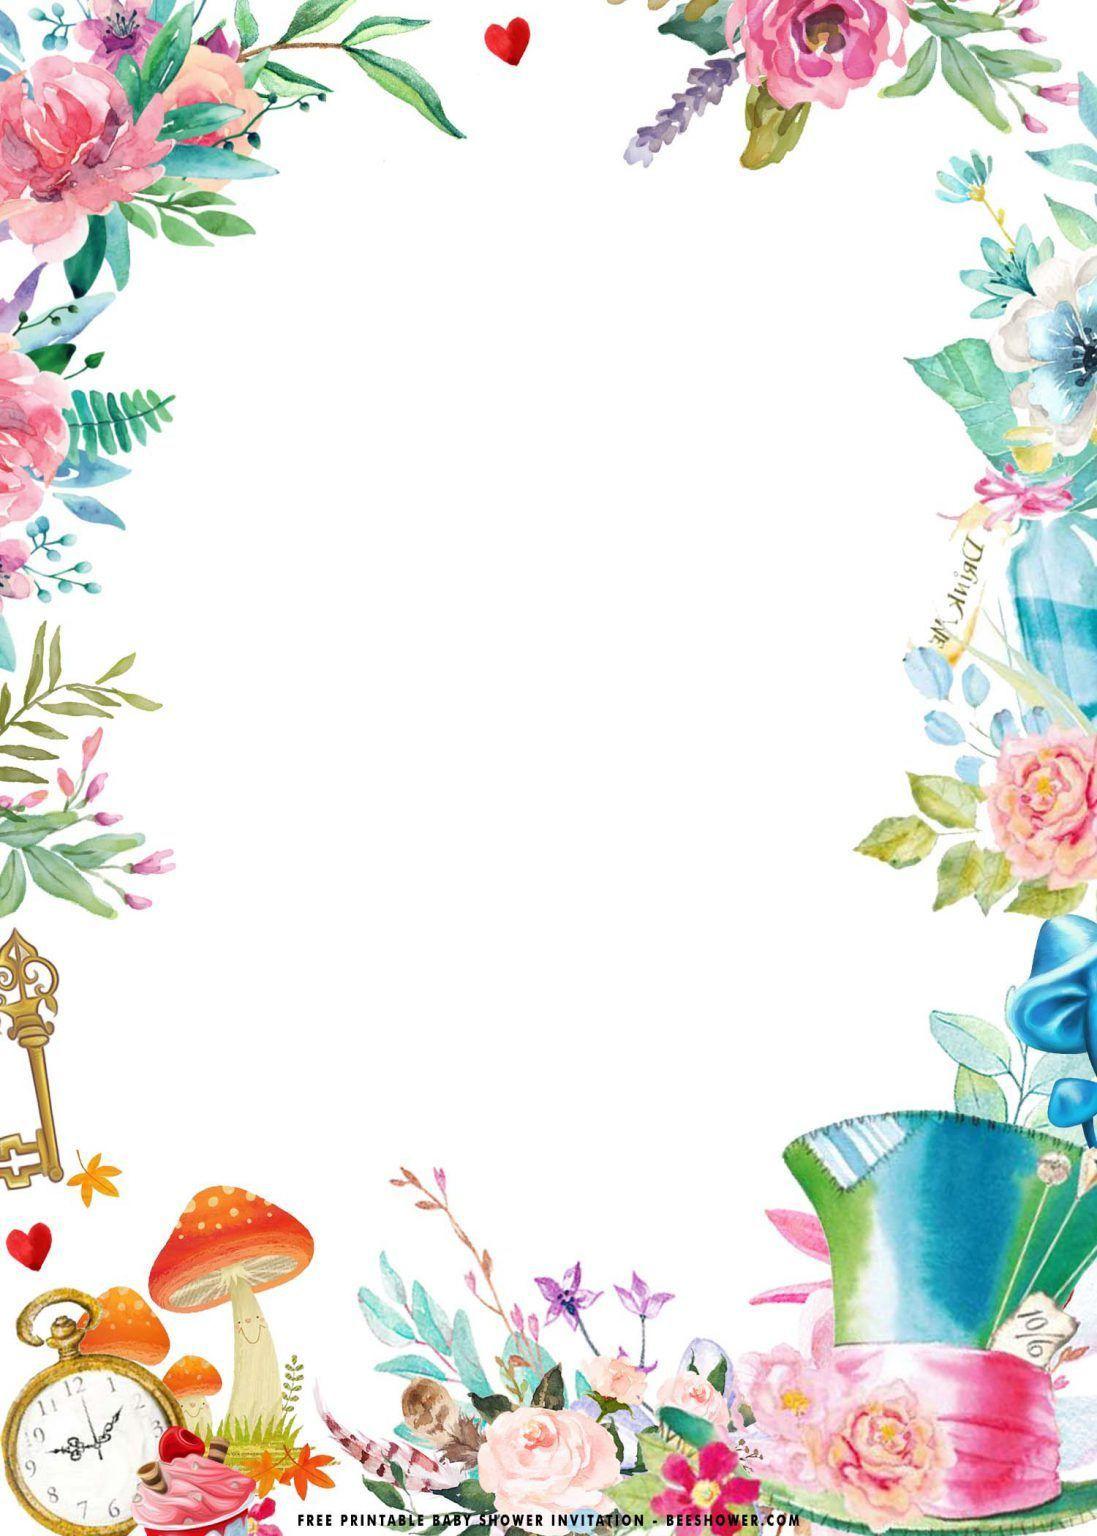 000 Best Alice In Wonderland Party Template Idea  Templates Invitation FreeFull